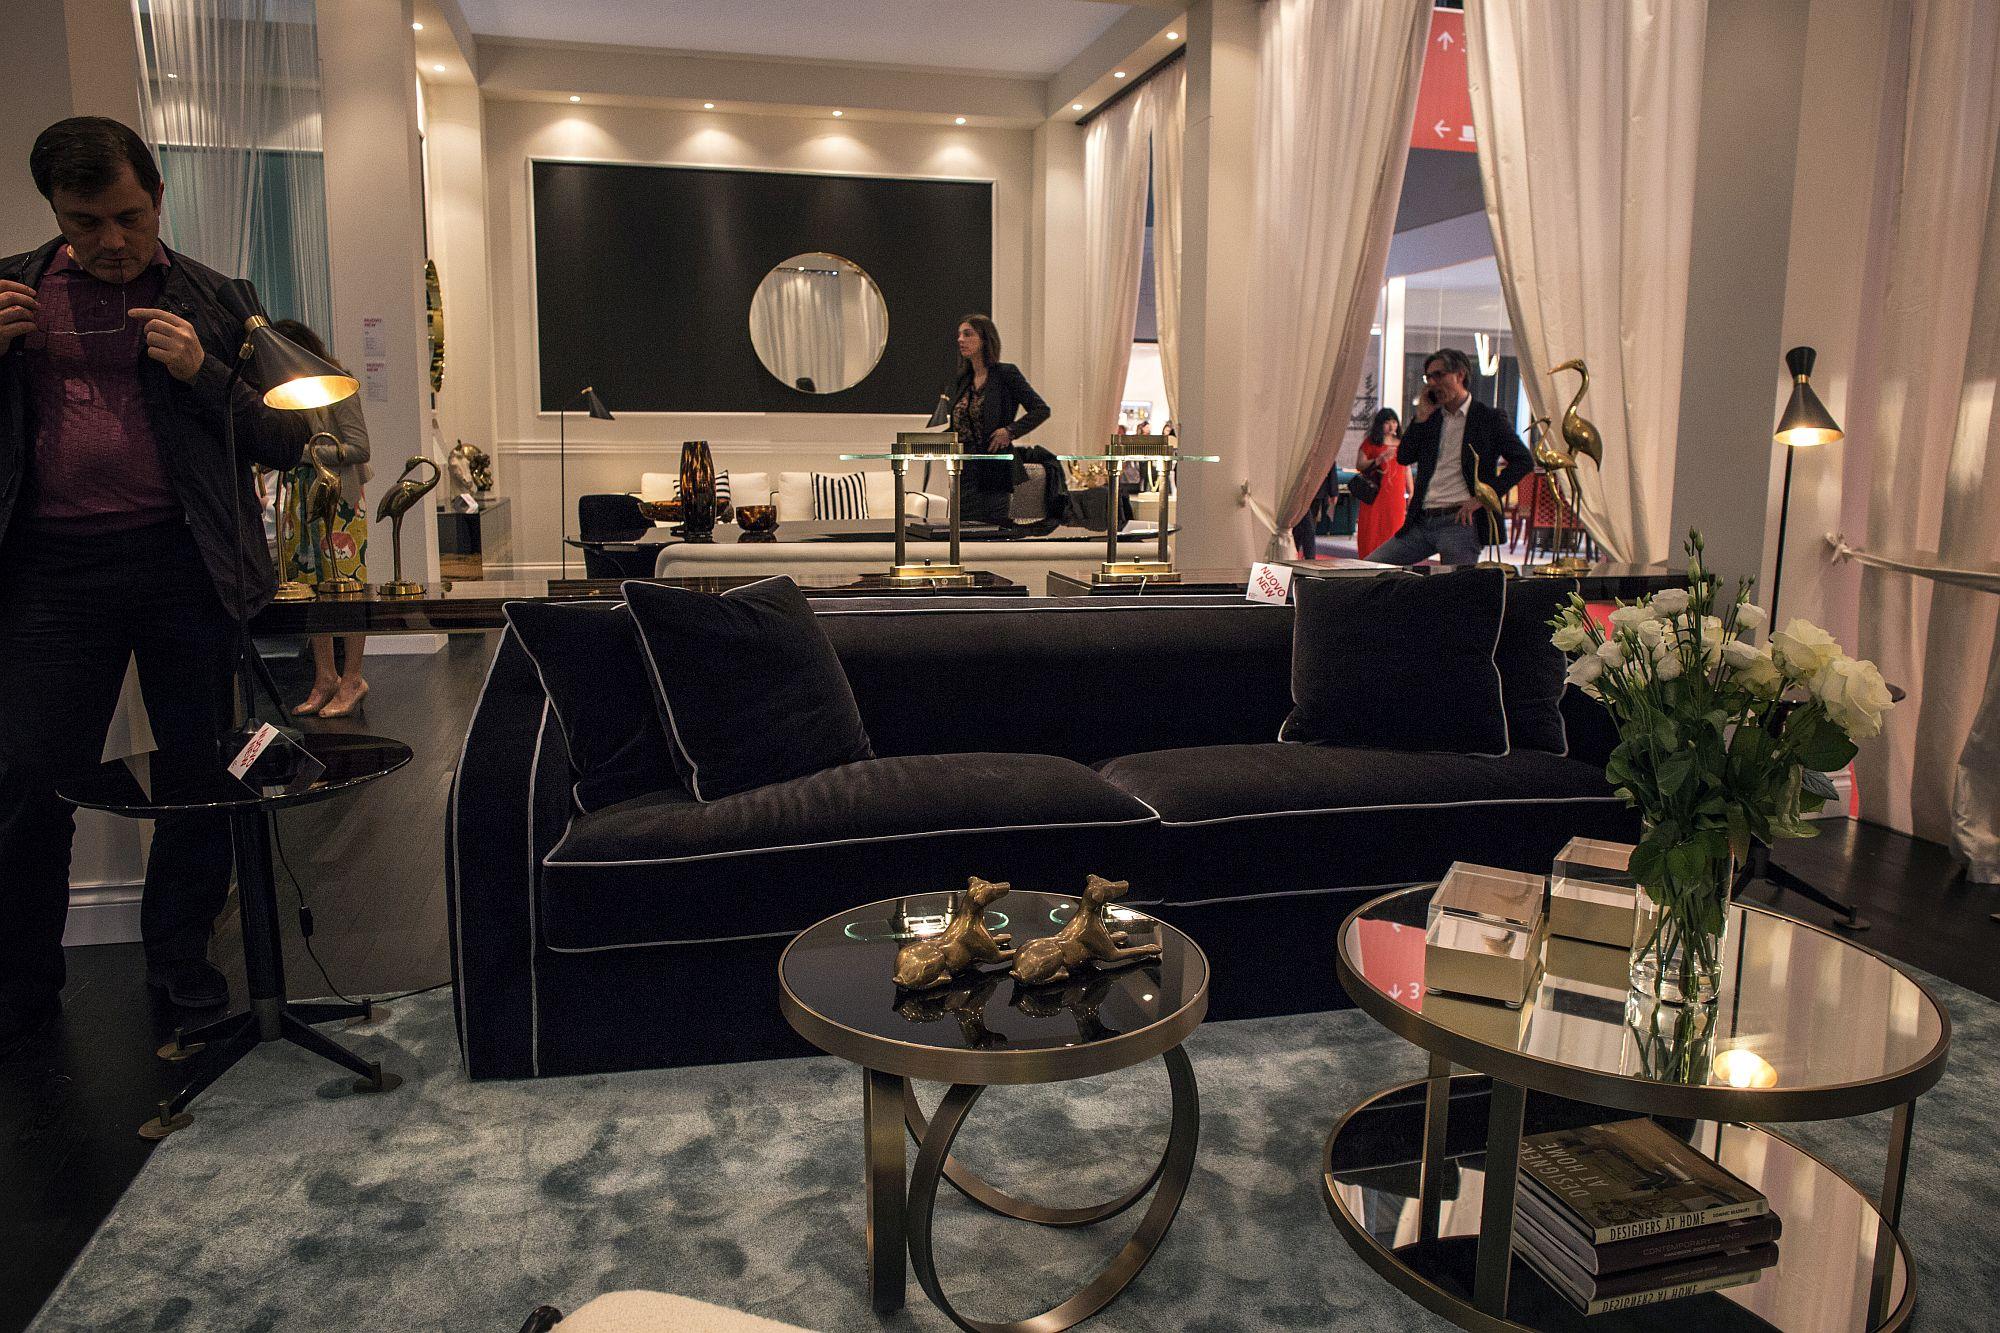 Exquisite-sofa-in-black-has-magnetic-charm